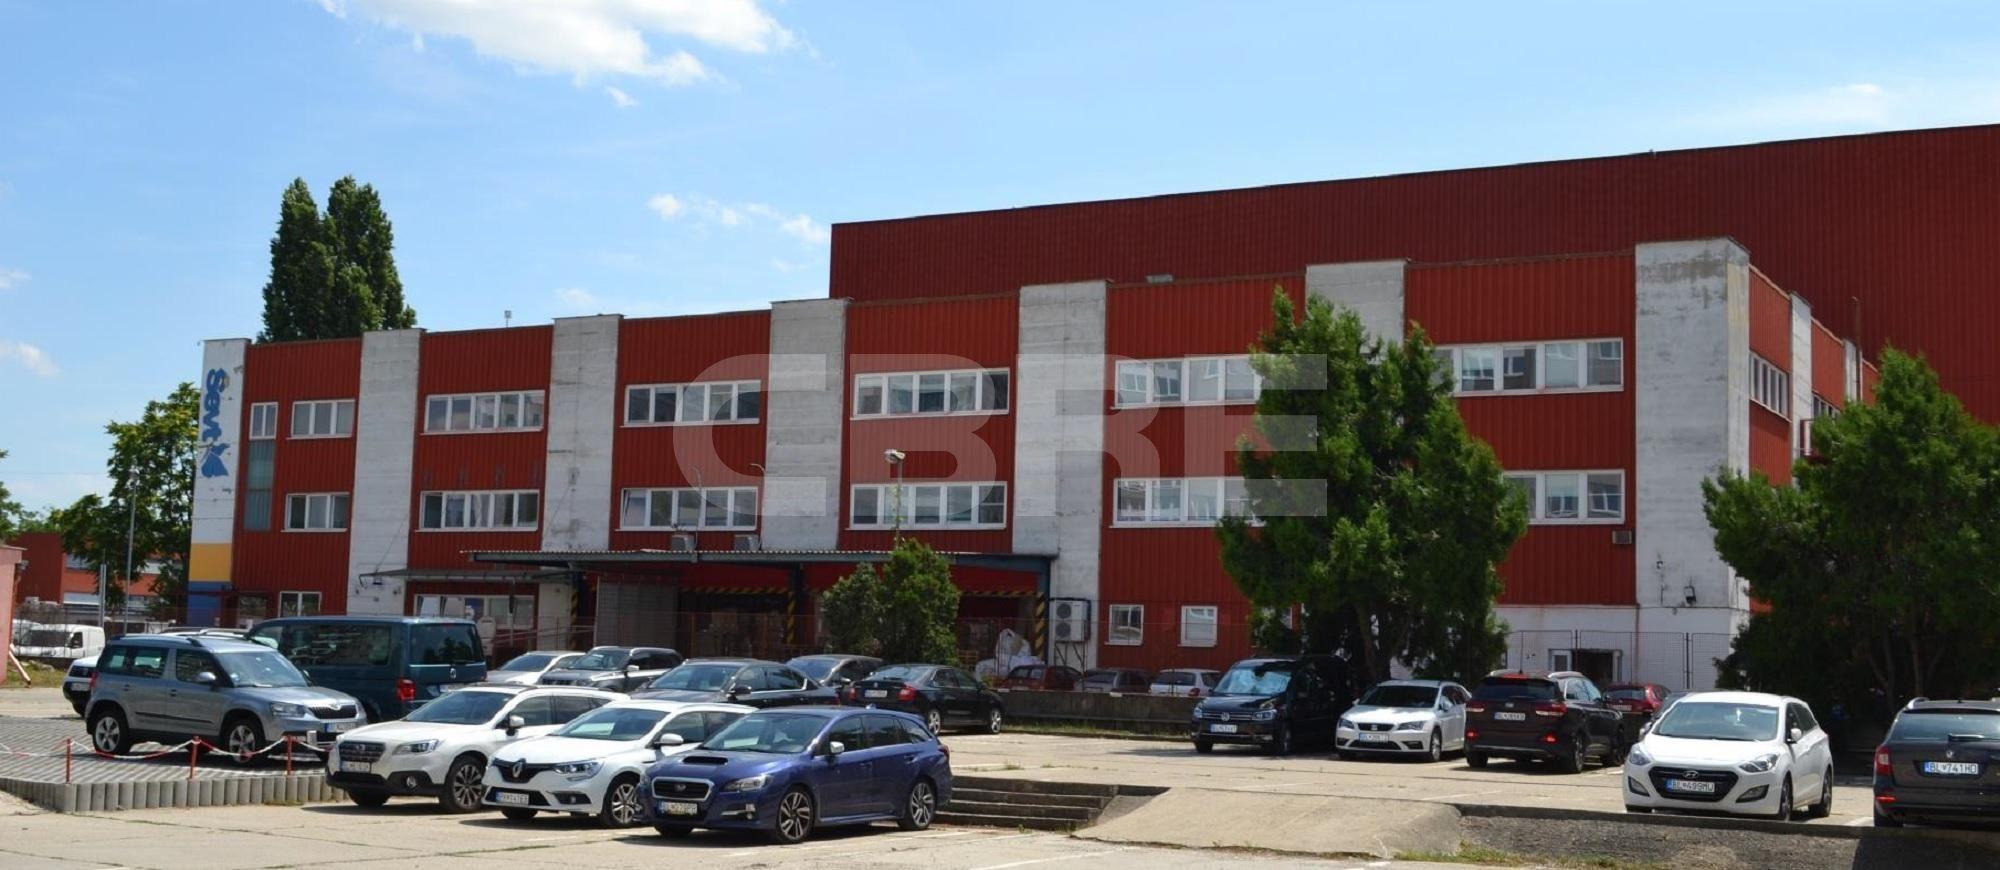 Plynarenska 6, Flexi box, Bratislava - Ružinov | Offices for rent by CBRE | 1